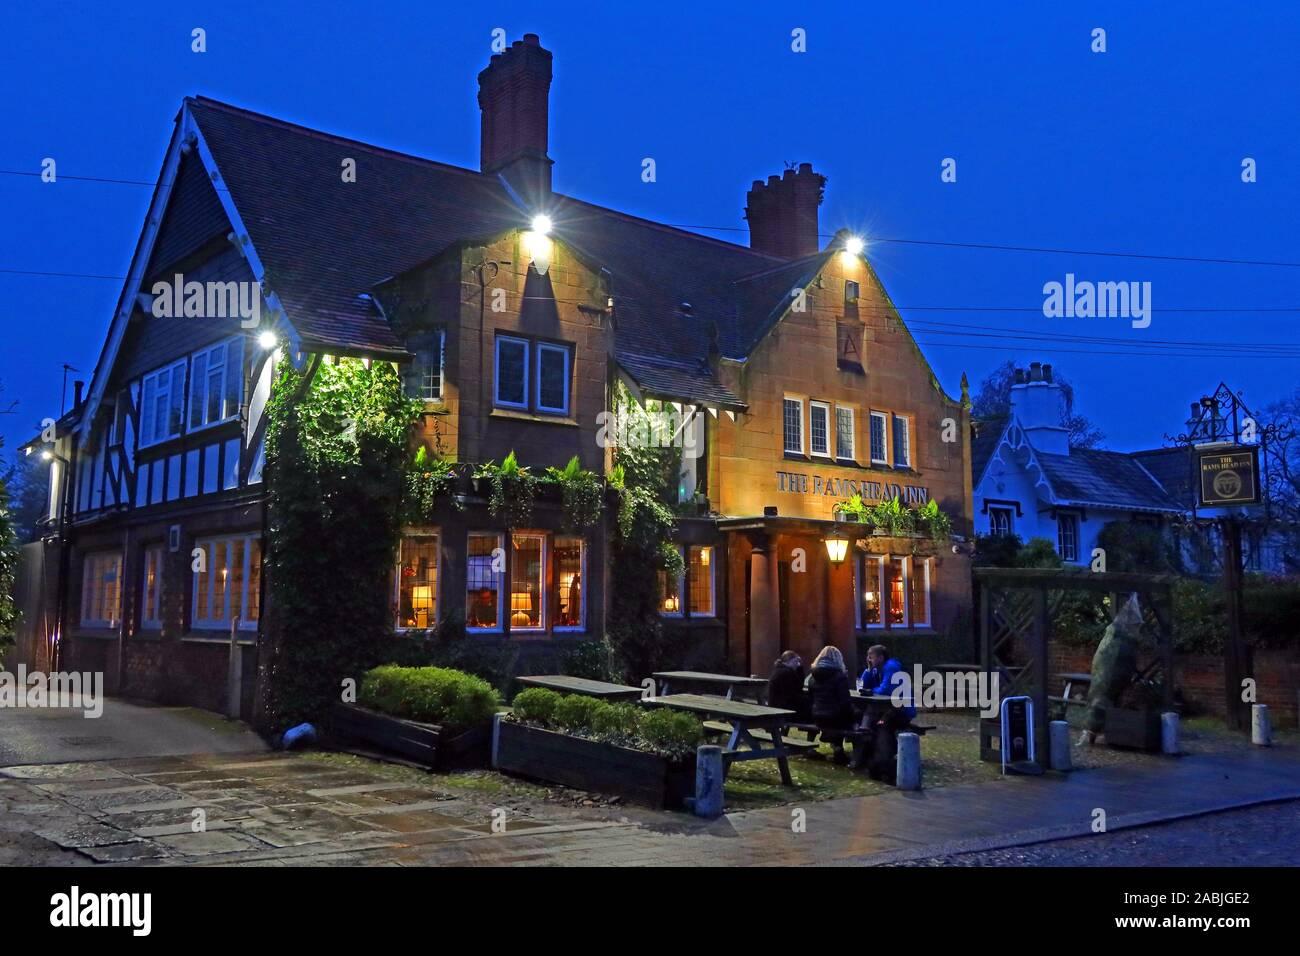 @HotpixUK,HotpixUK,GoTonySmith,UK,pub,bar,village,Warrington,South Warrington,centre,night,historic,building,Rams Head Pub,Church Lane,Grappenhall,Cheshire,England,WA4 3EP,WA4,architectural importance,historical importance,Ram Head,Grappenhall Village,at dusk,dusk,at night,beer garden,hotel,village pub